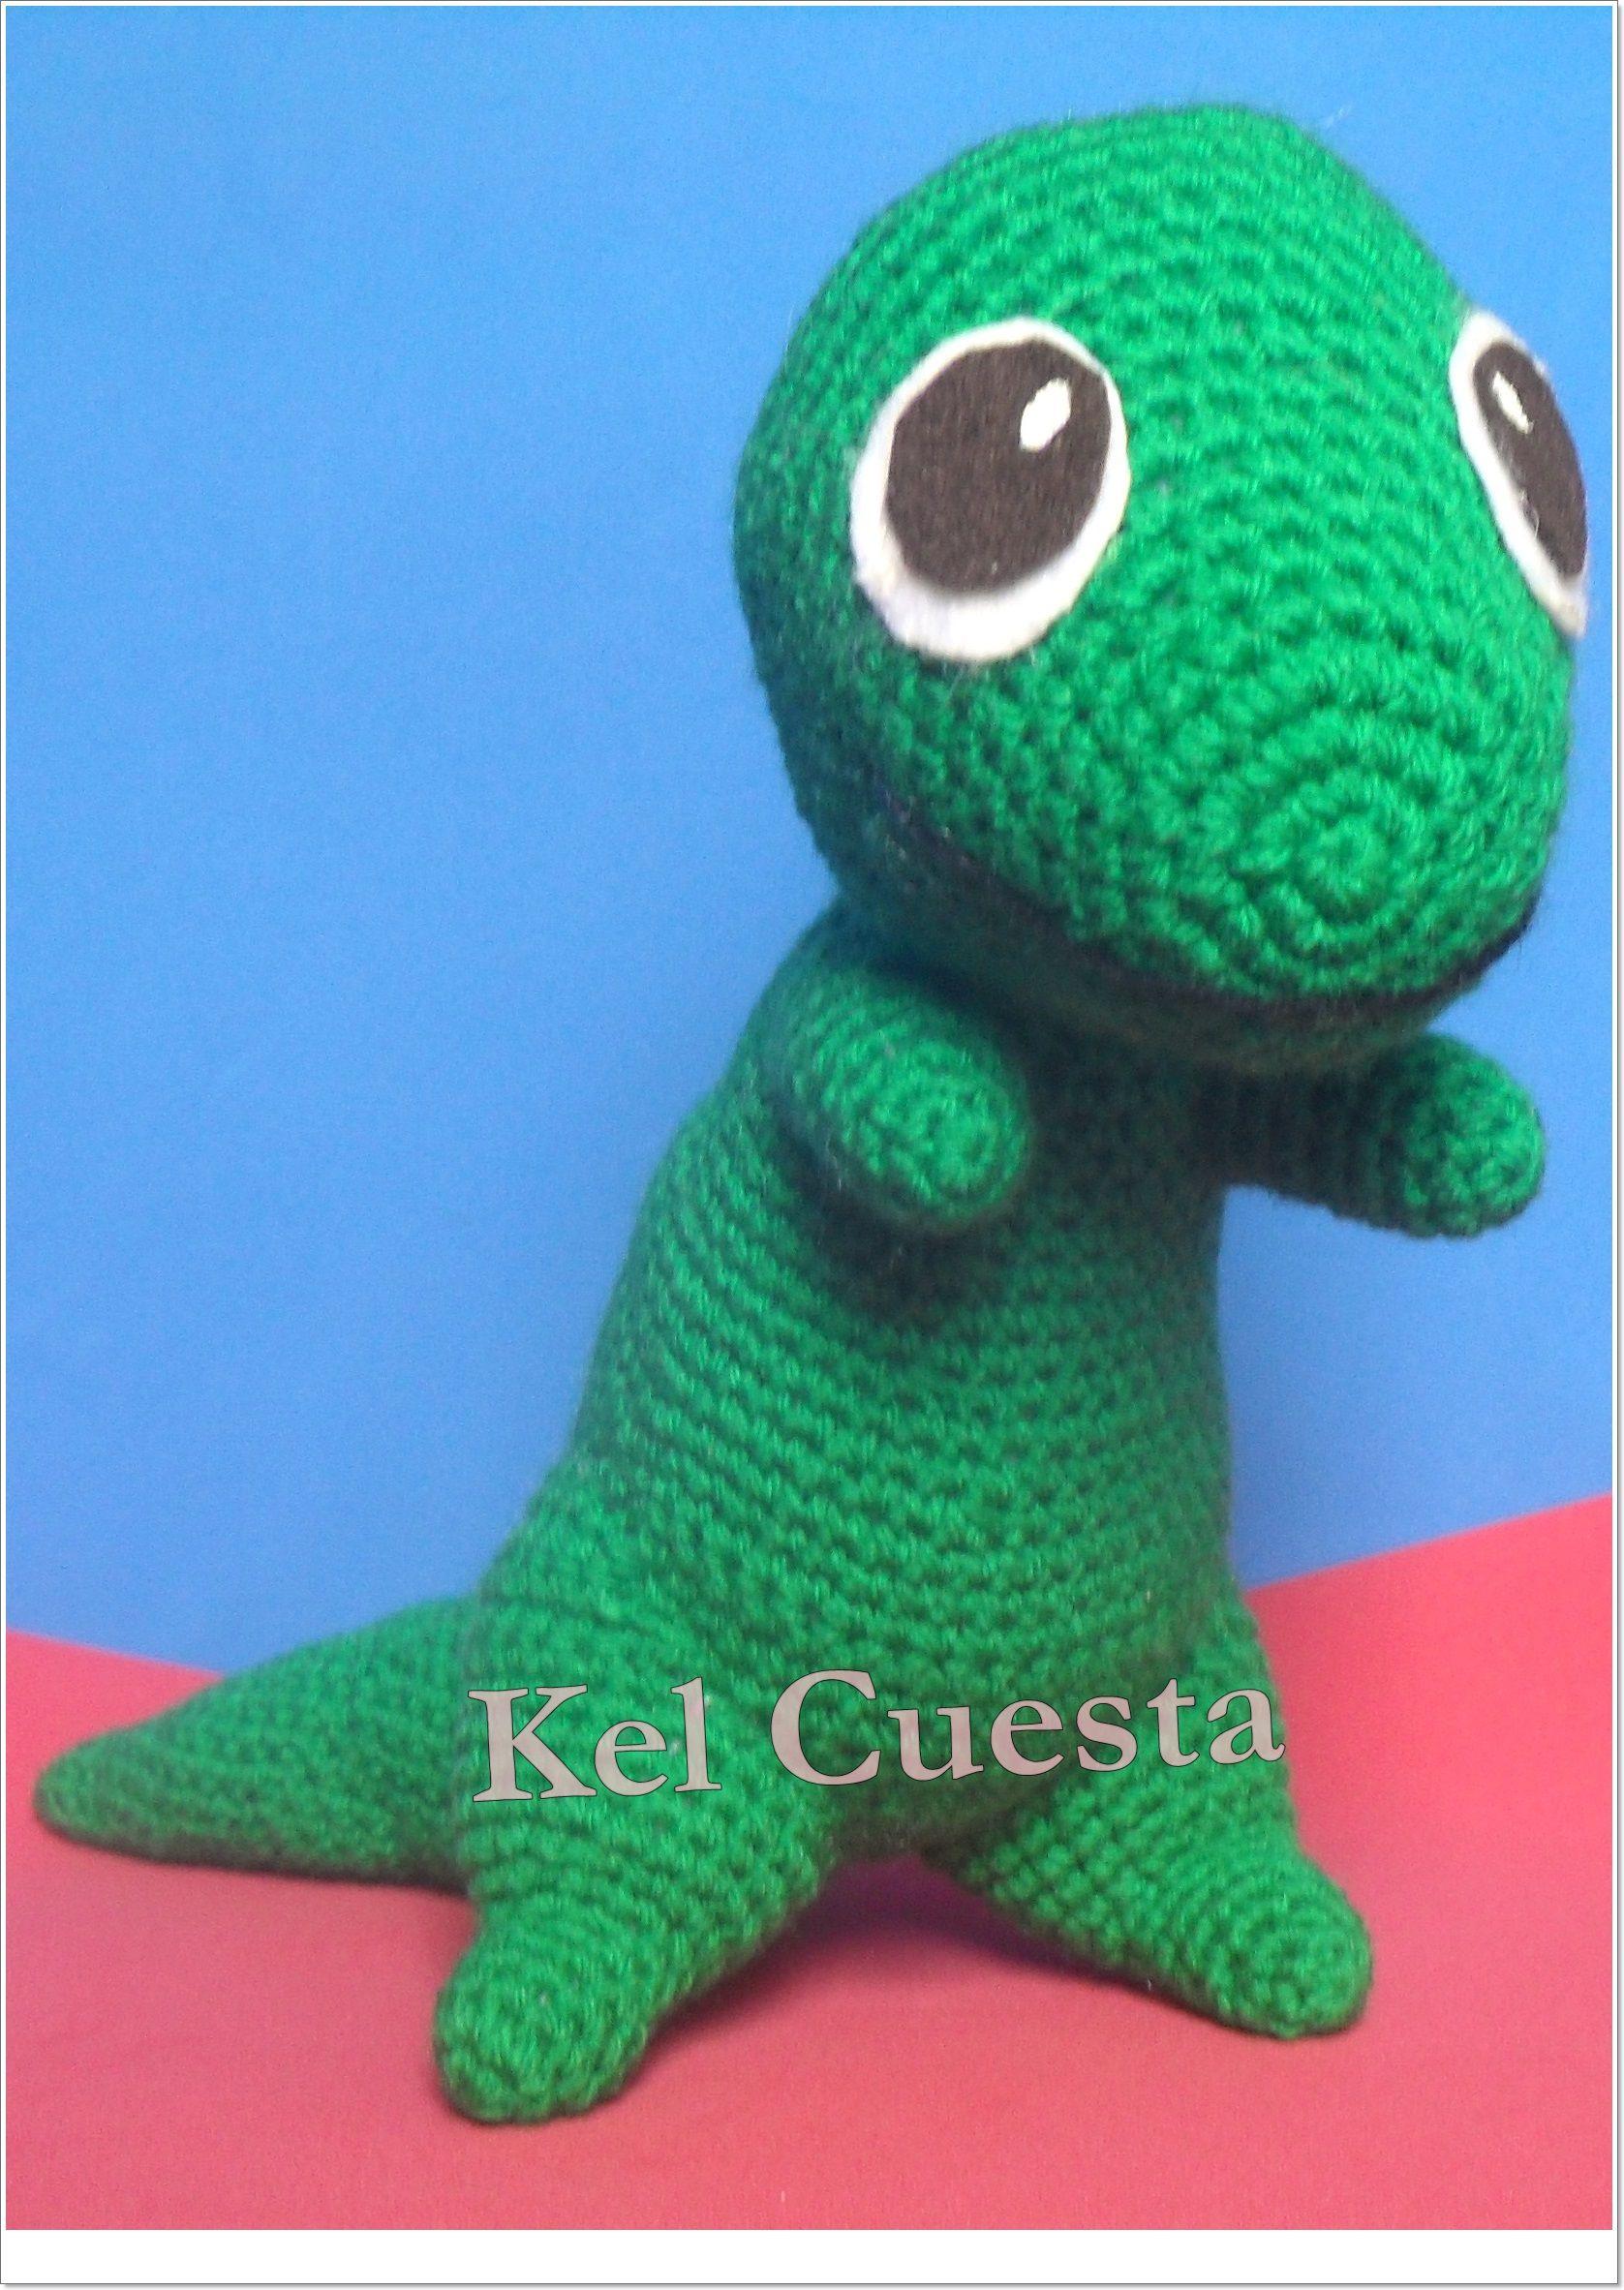 Dinossauro em crochê - amigurumi